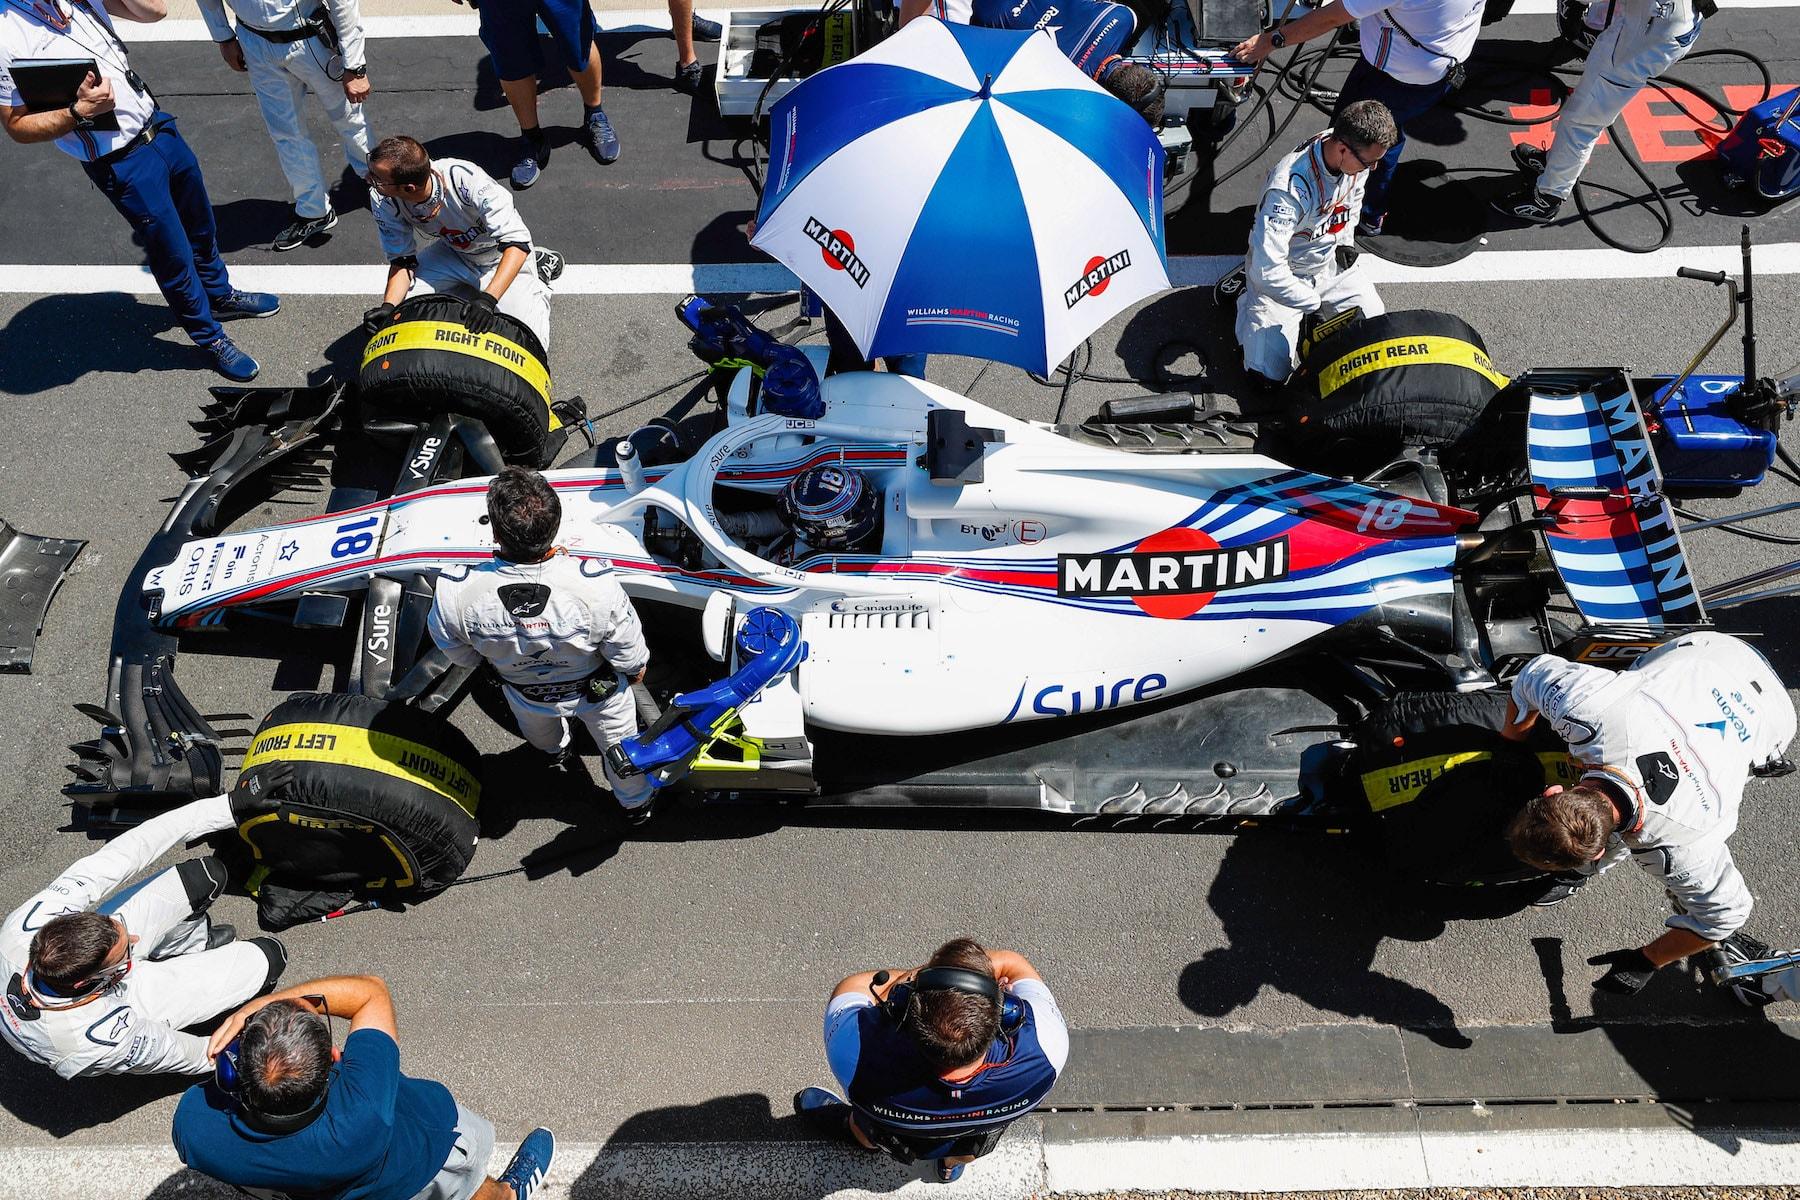 B 2018 Lance Stroll | Williams FW41 | 2018 British GP 1 copy.jpg